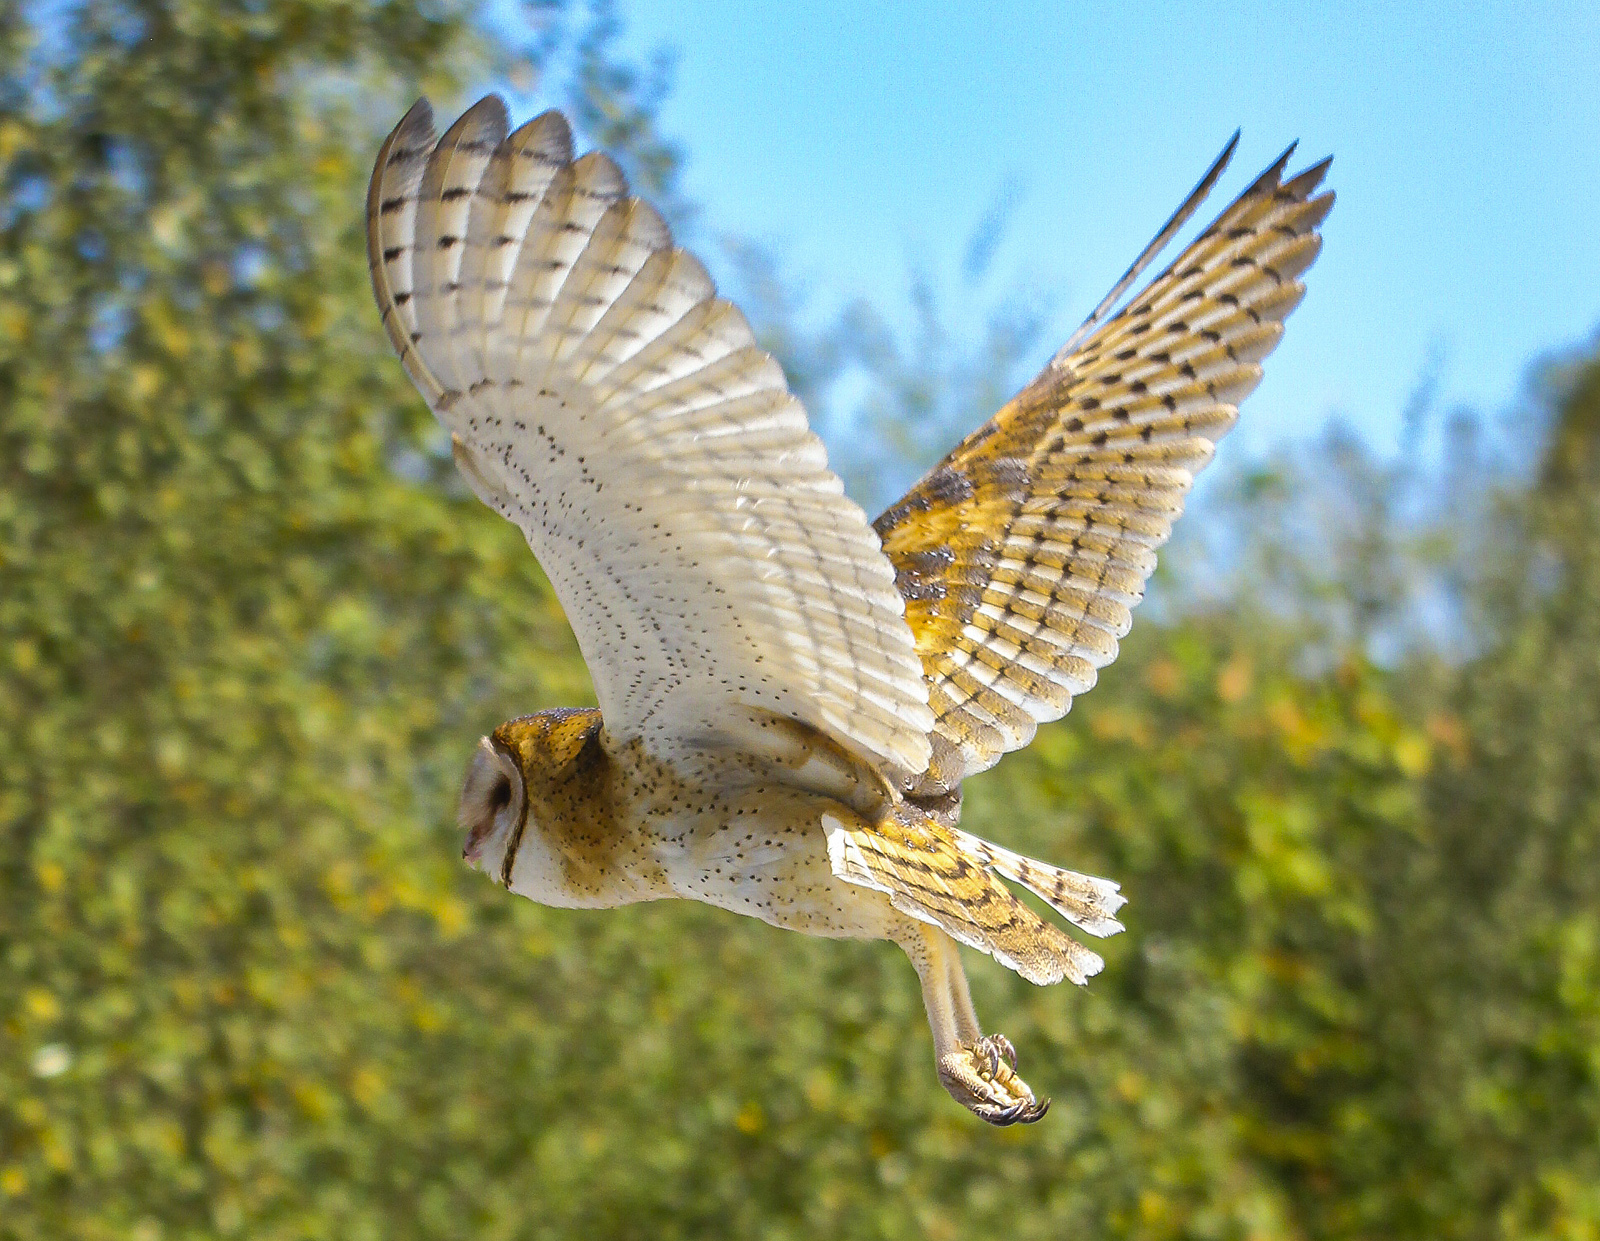 The Owl Pellet Economy Meet The Entrepreneurs Who Ve Devoted Their Lives To Bird Vomit The Washington Post